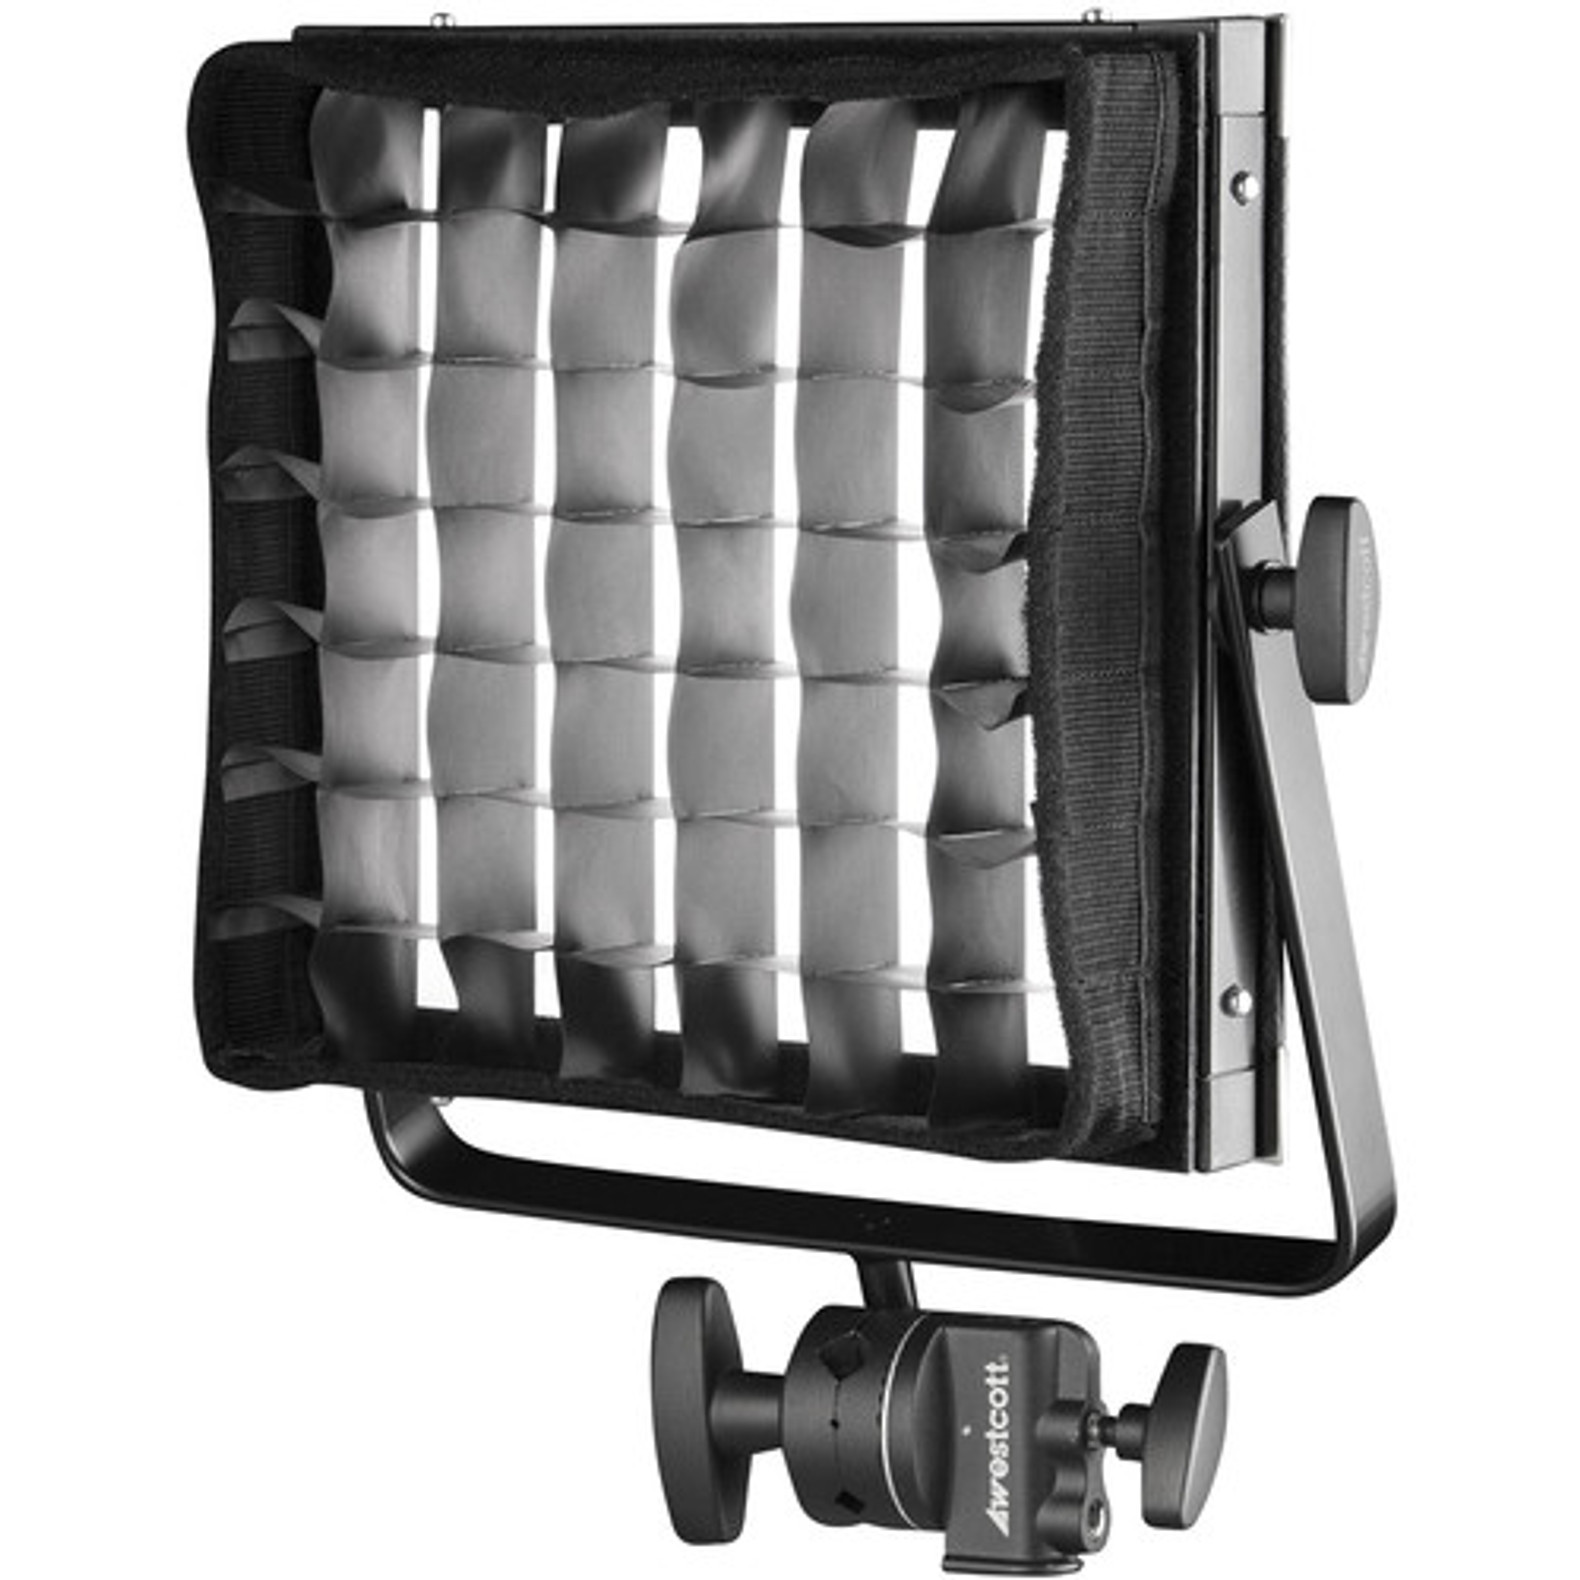 1 x 2 Westcott Flex Cine Softbox Egg Crate Grid